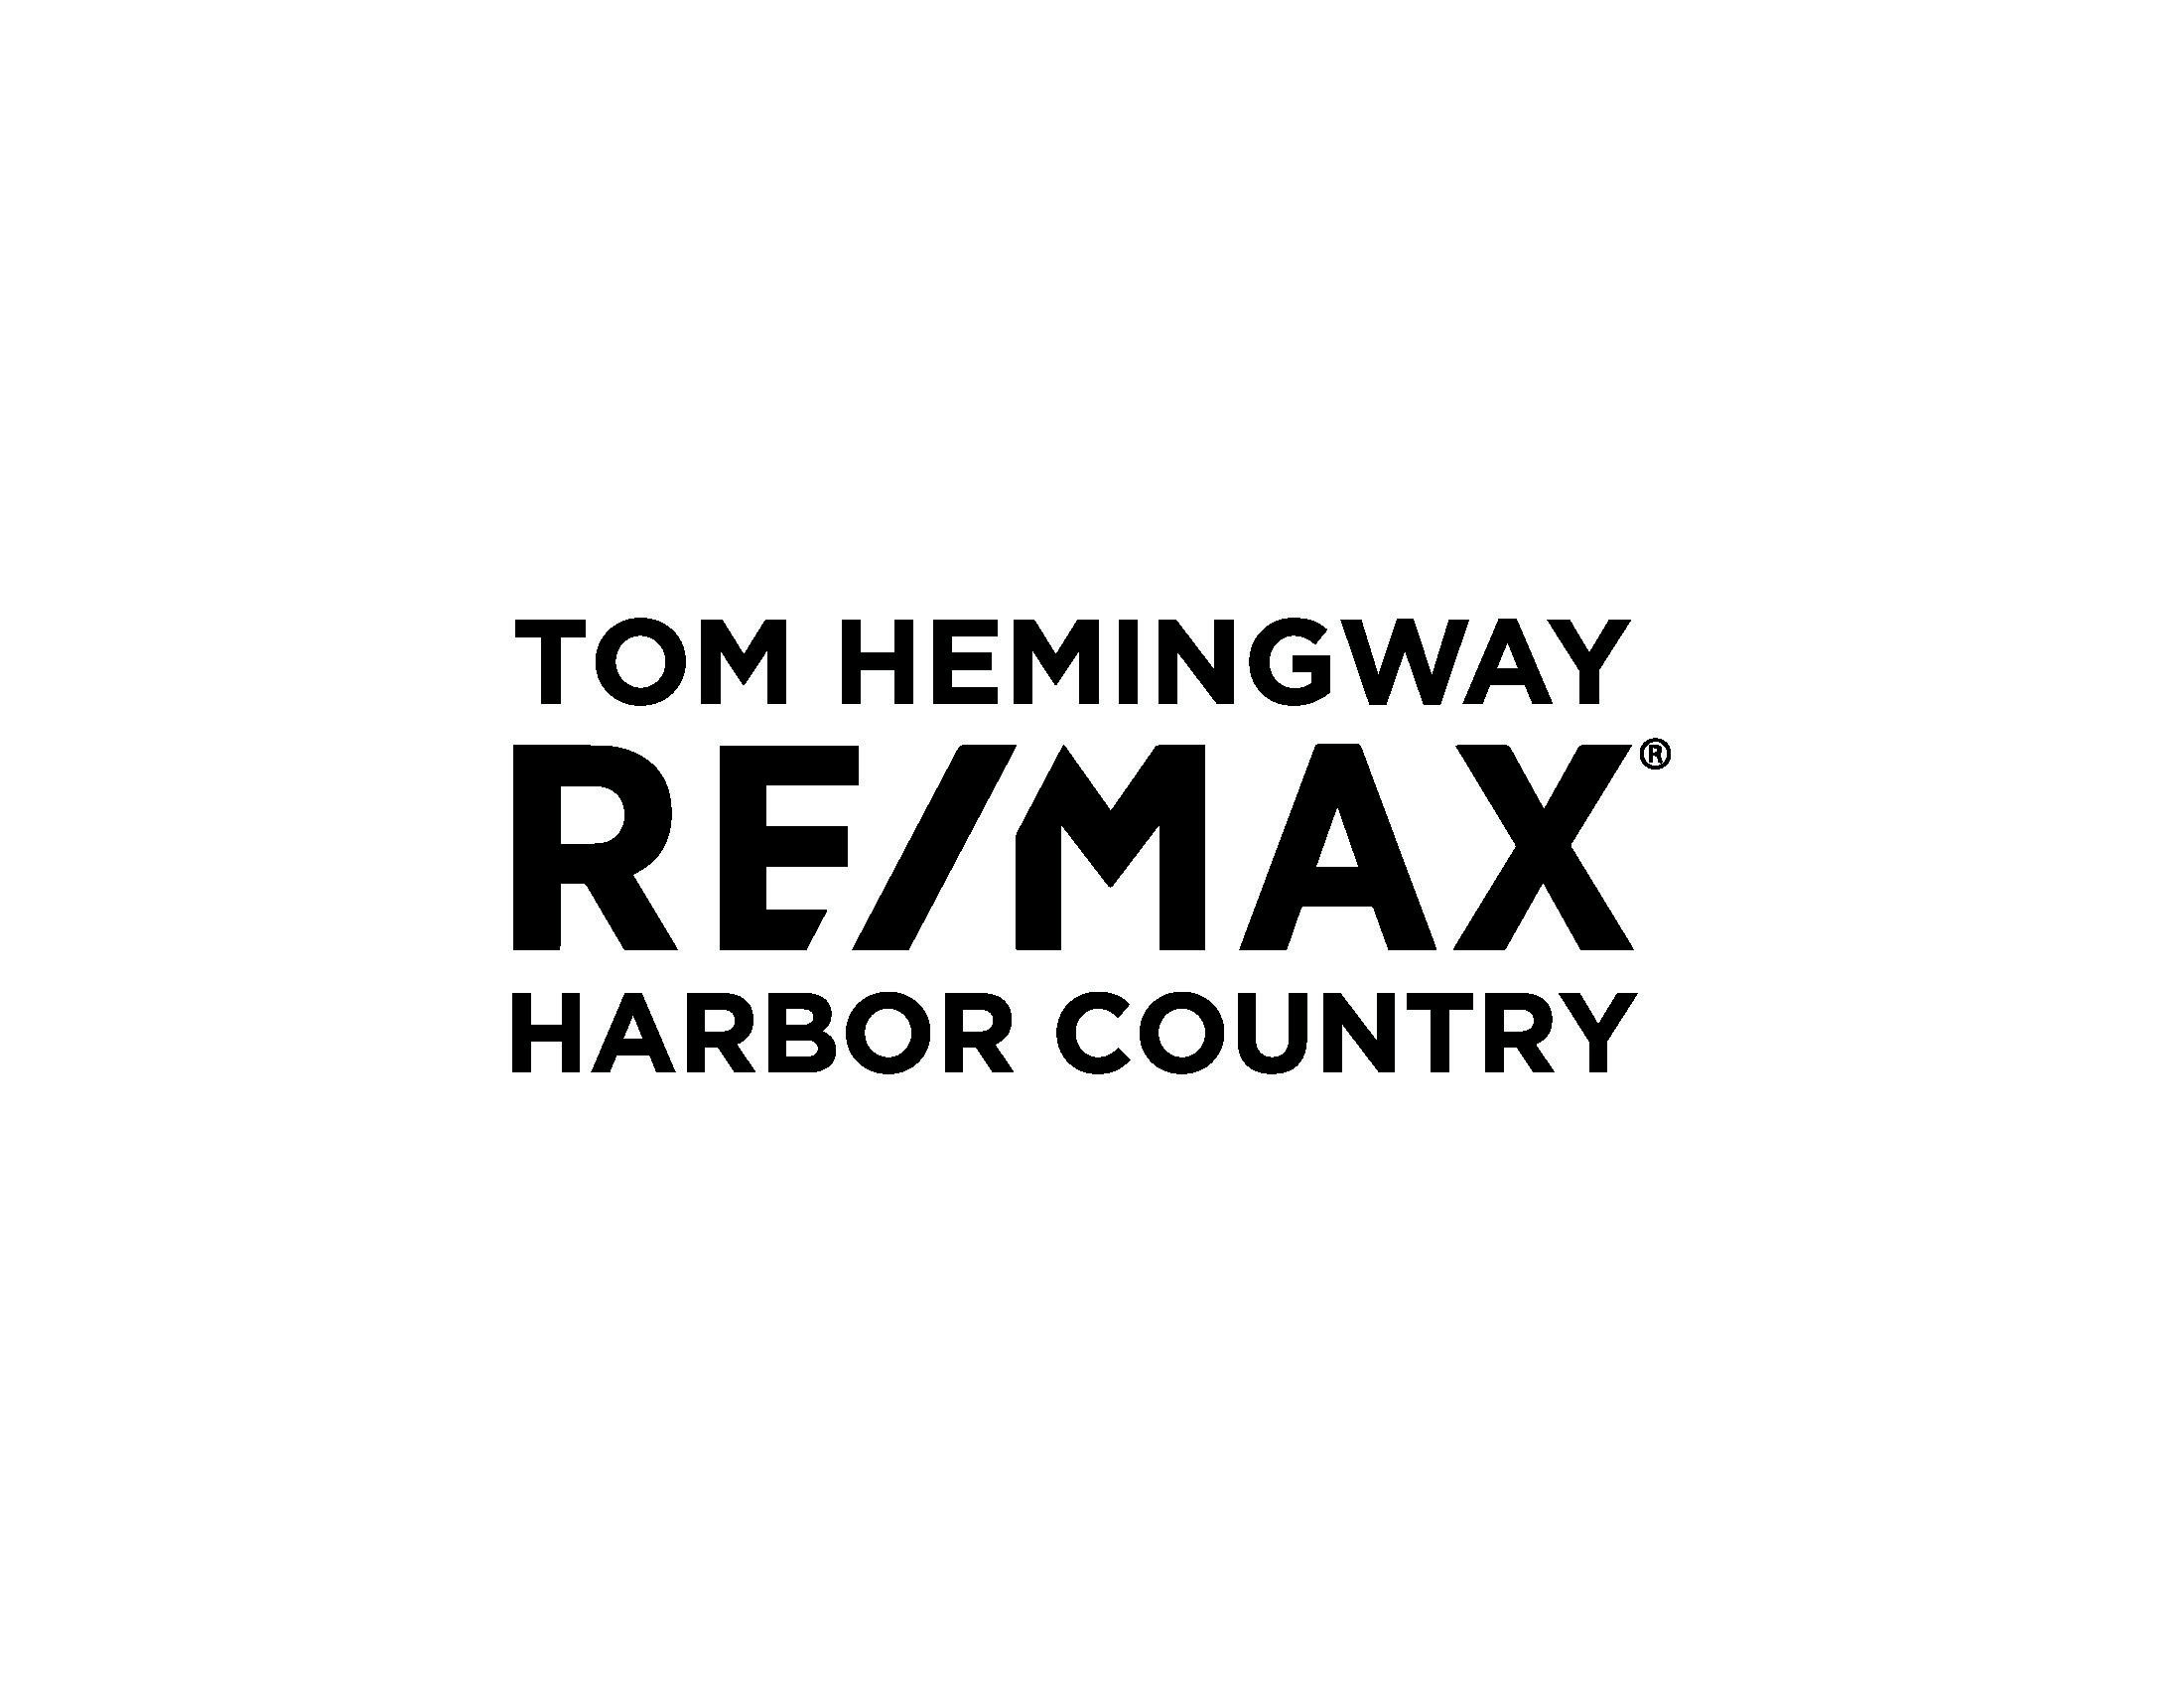 REMAX Tom Hemingway (1).jpg